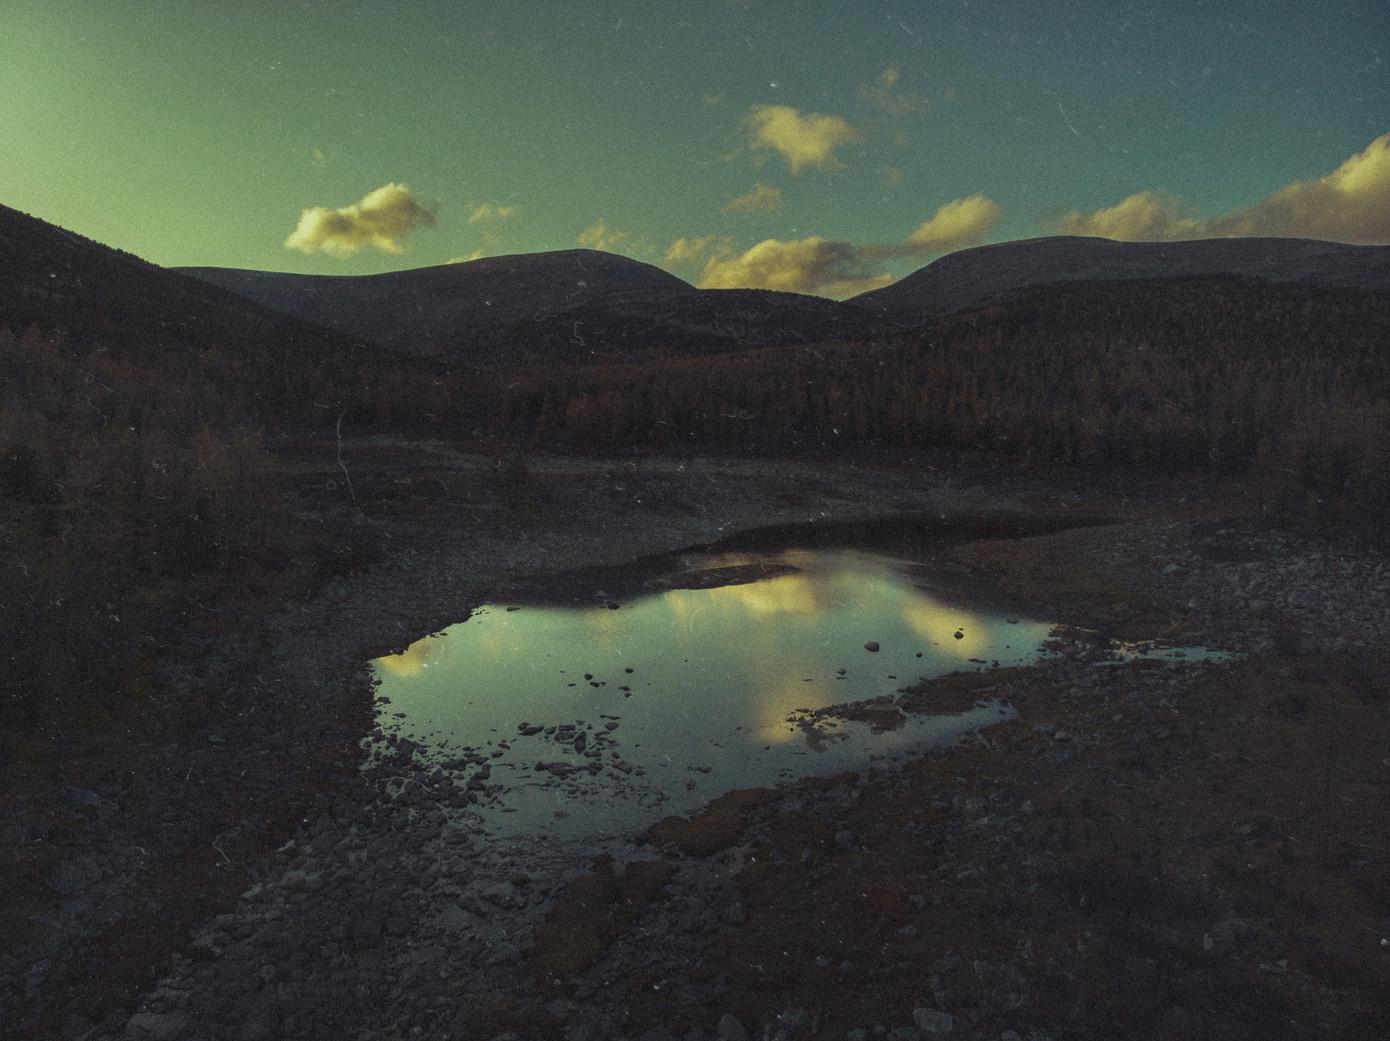 Lac rennes